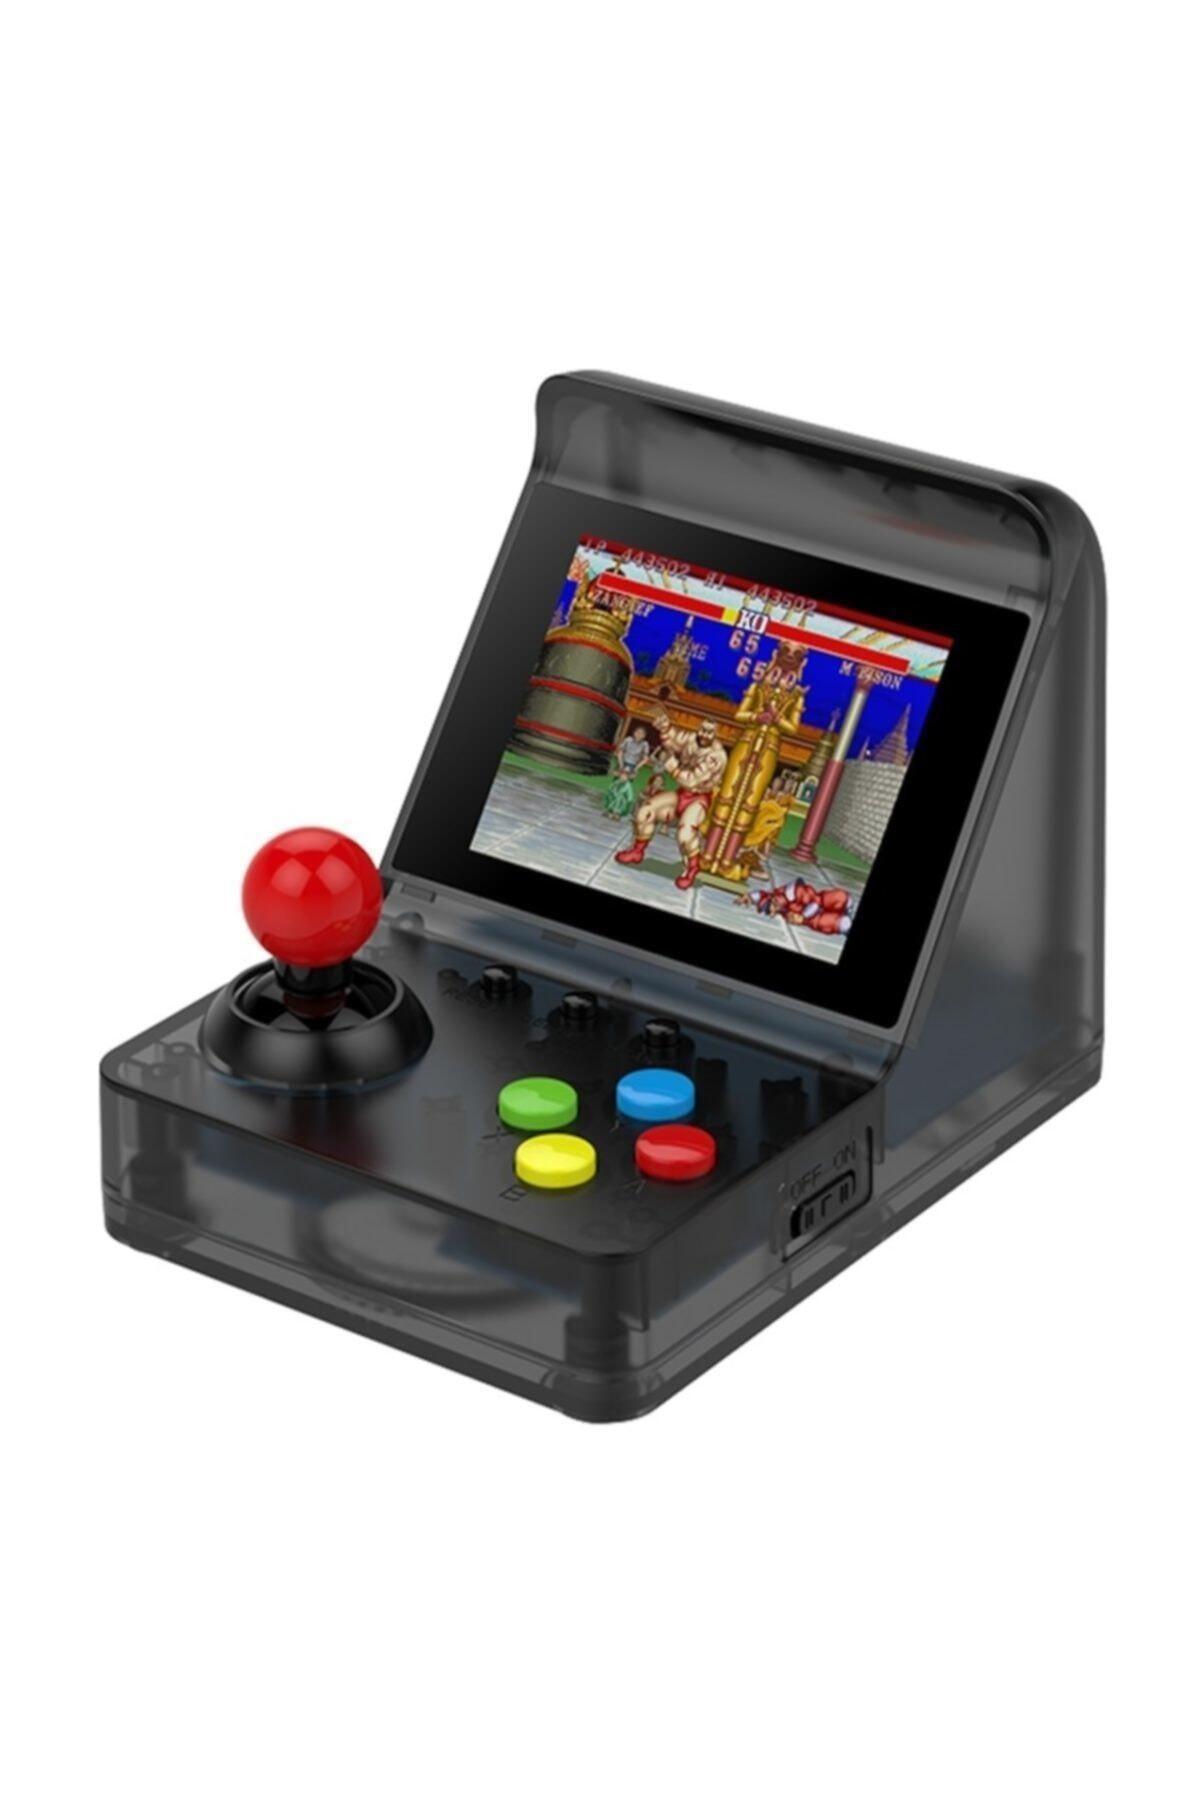 Mini Retro Retro Mini Arcade 16gb 3000 Oyunlu Ekranlı Atari Oyun Makinesi 1